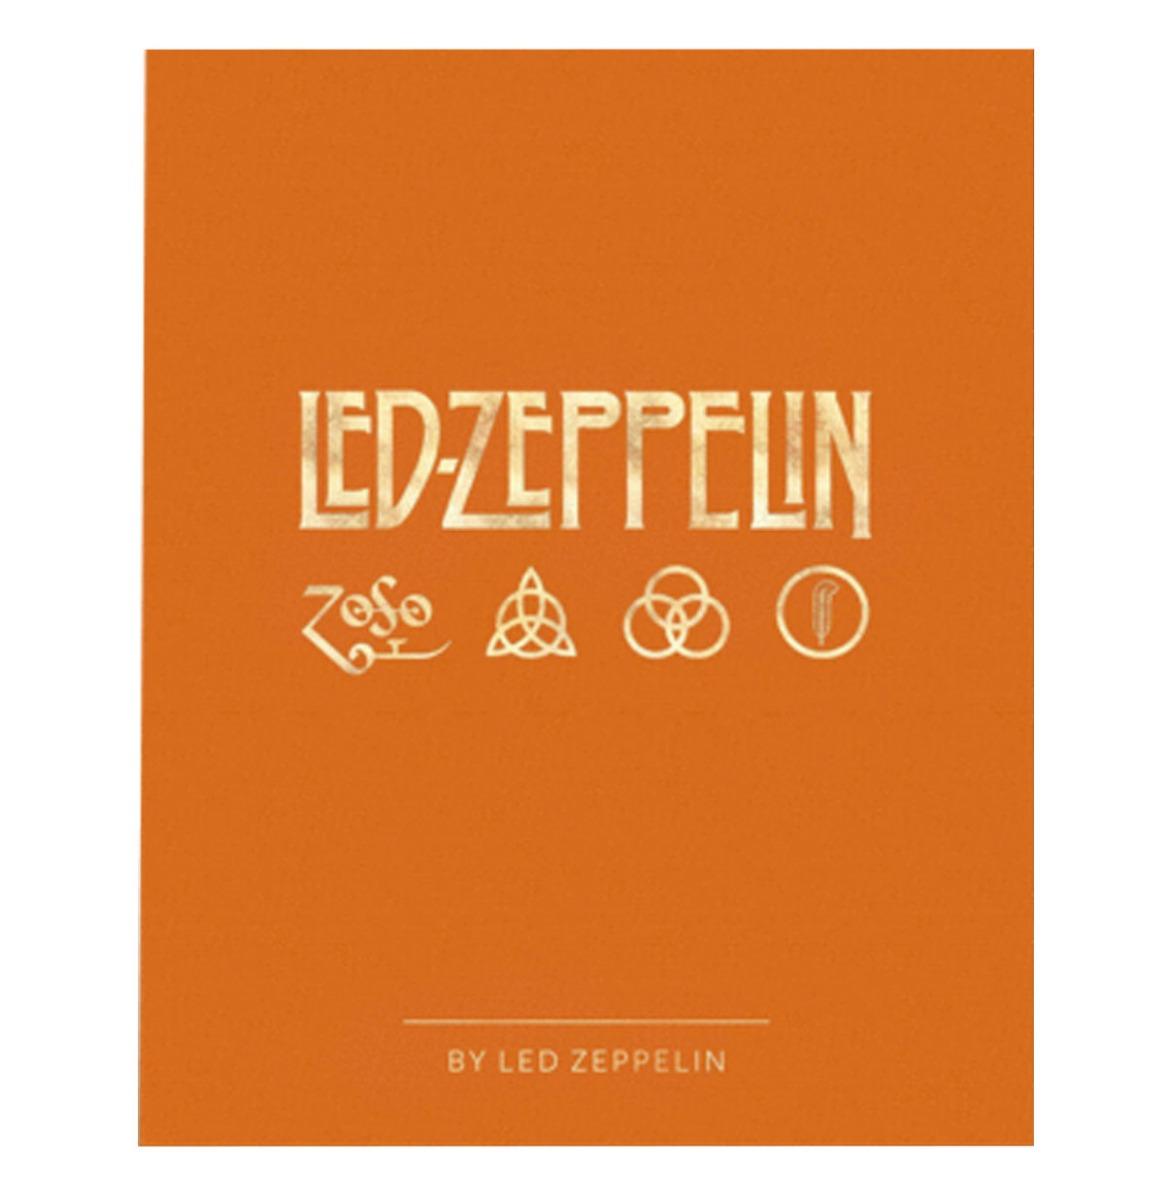 Led Zeppelin - By Led Zeppelin - Official 50th Anniversary Illustrated Boek